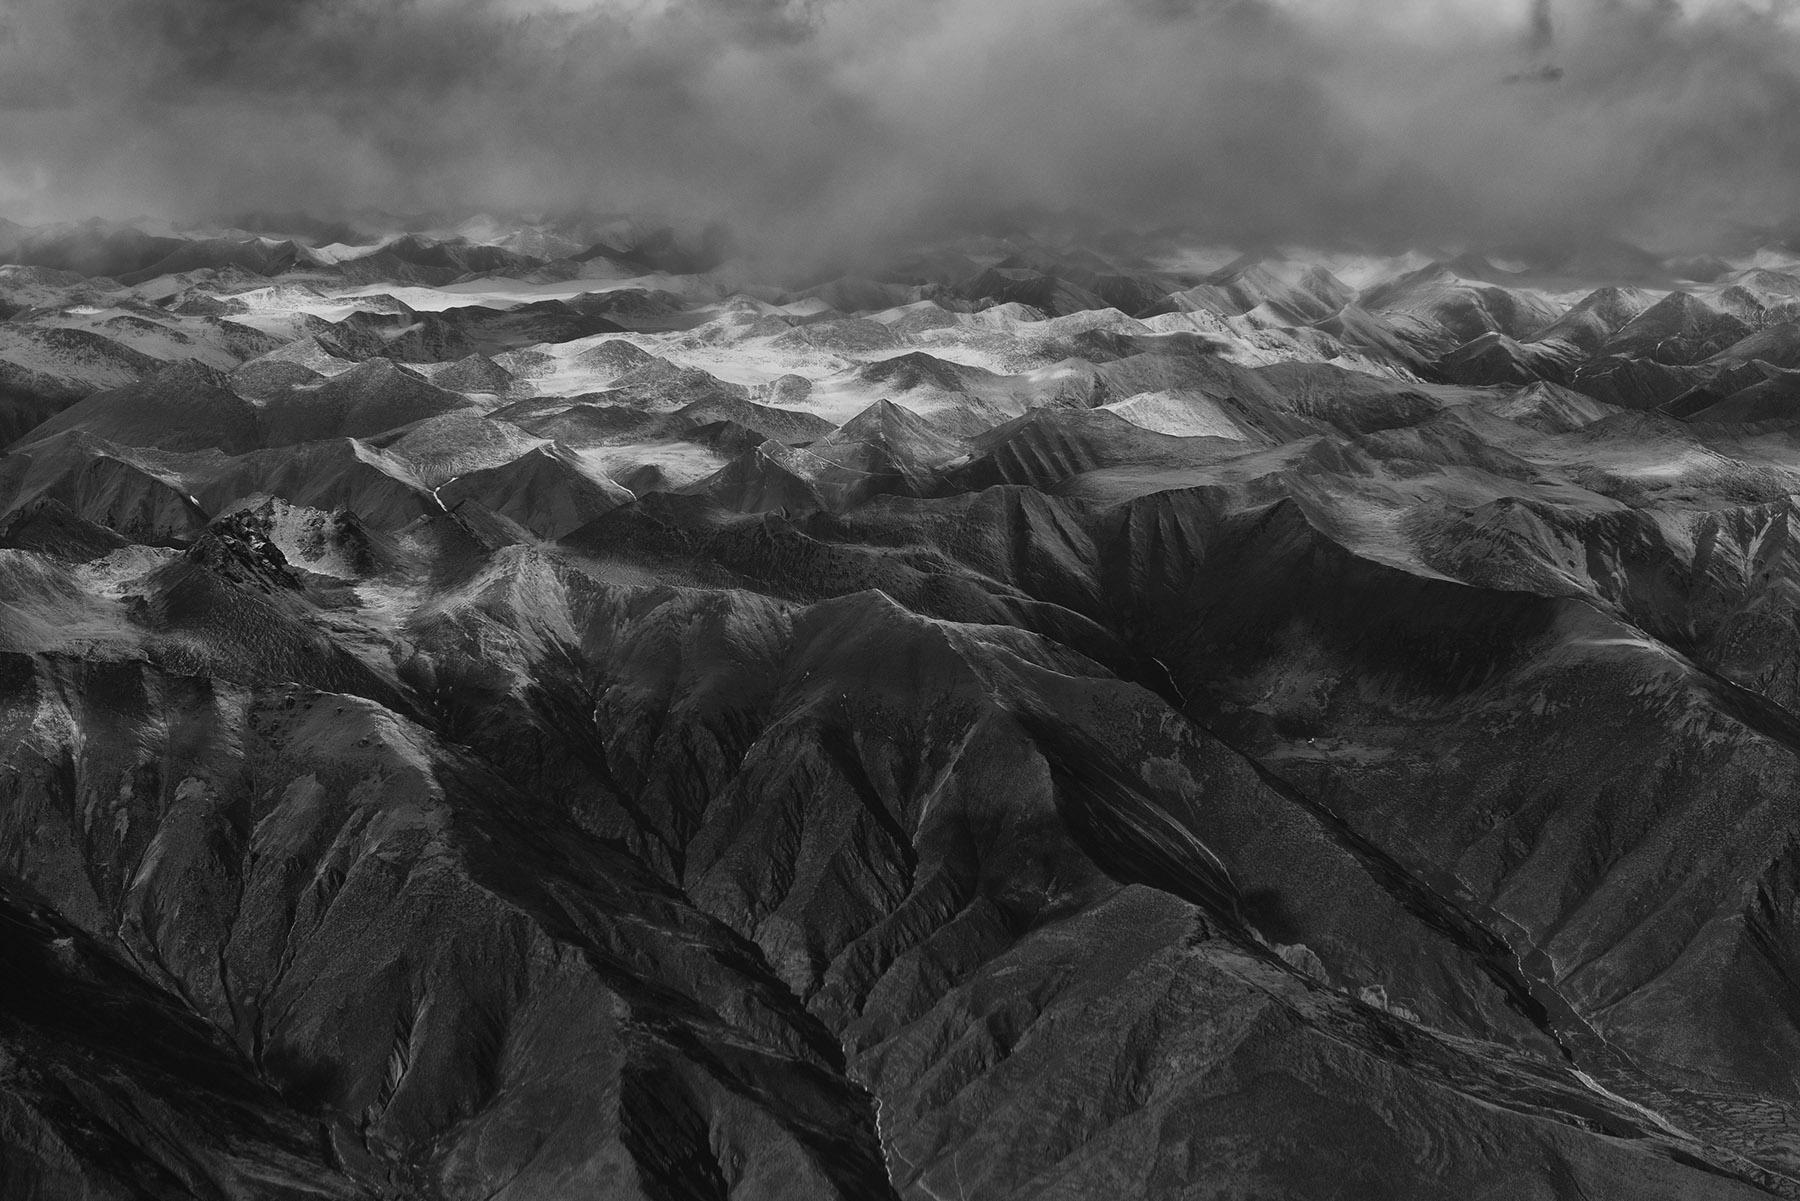 himalayan-mountains-winter.jpg